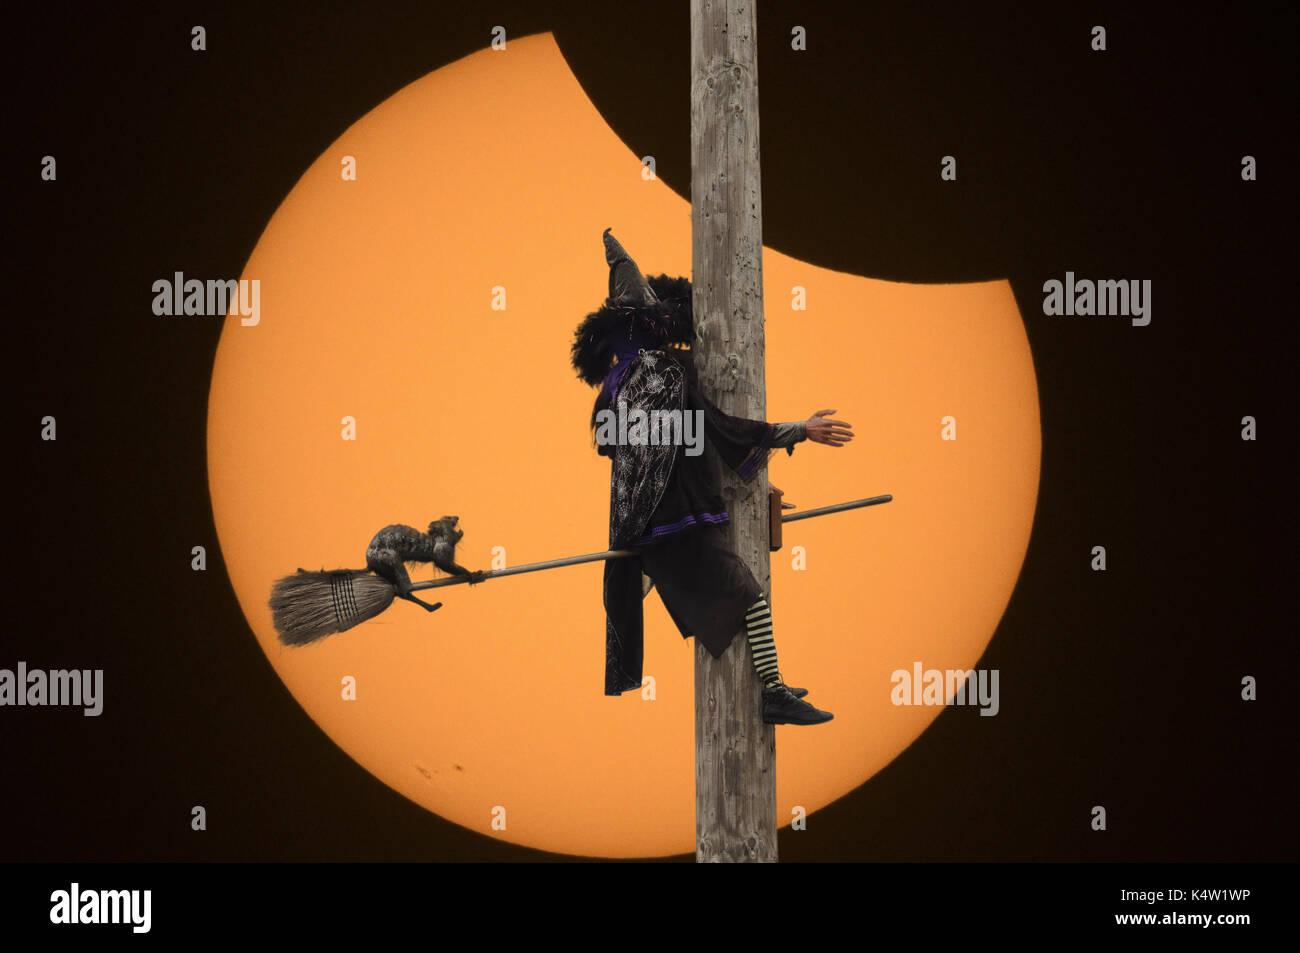 Crashing While Eclipsing - Stock Image